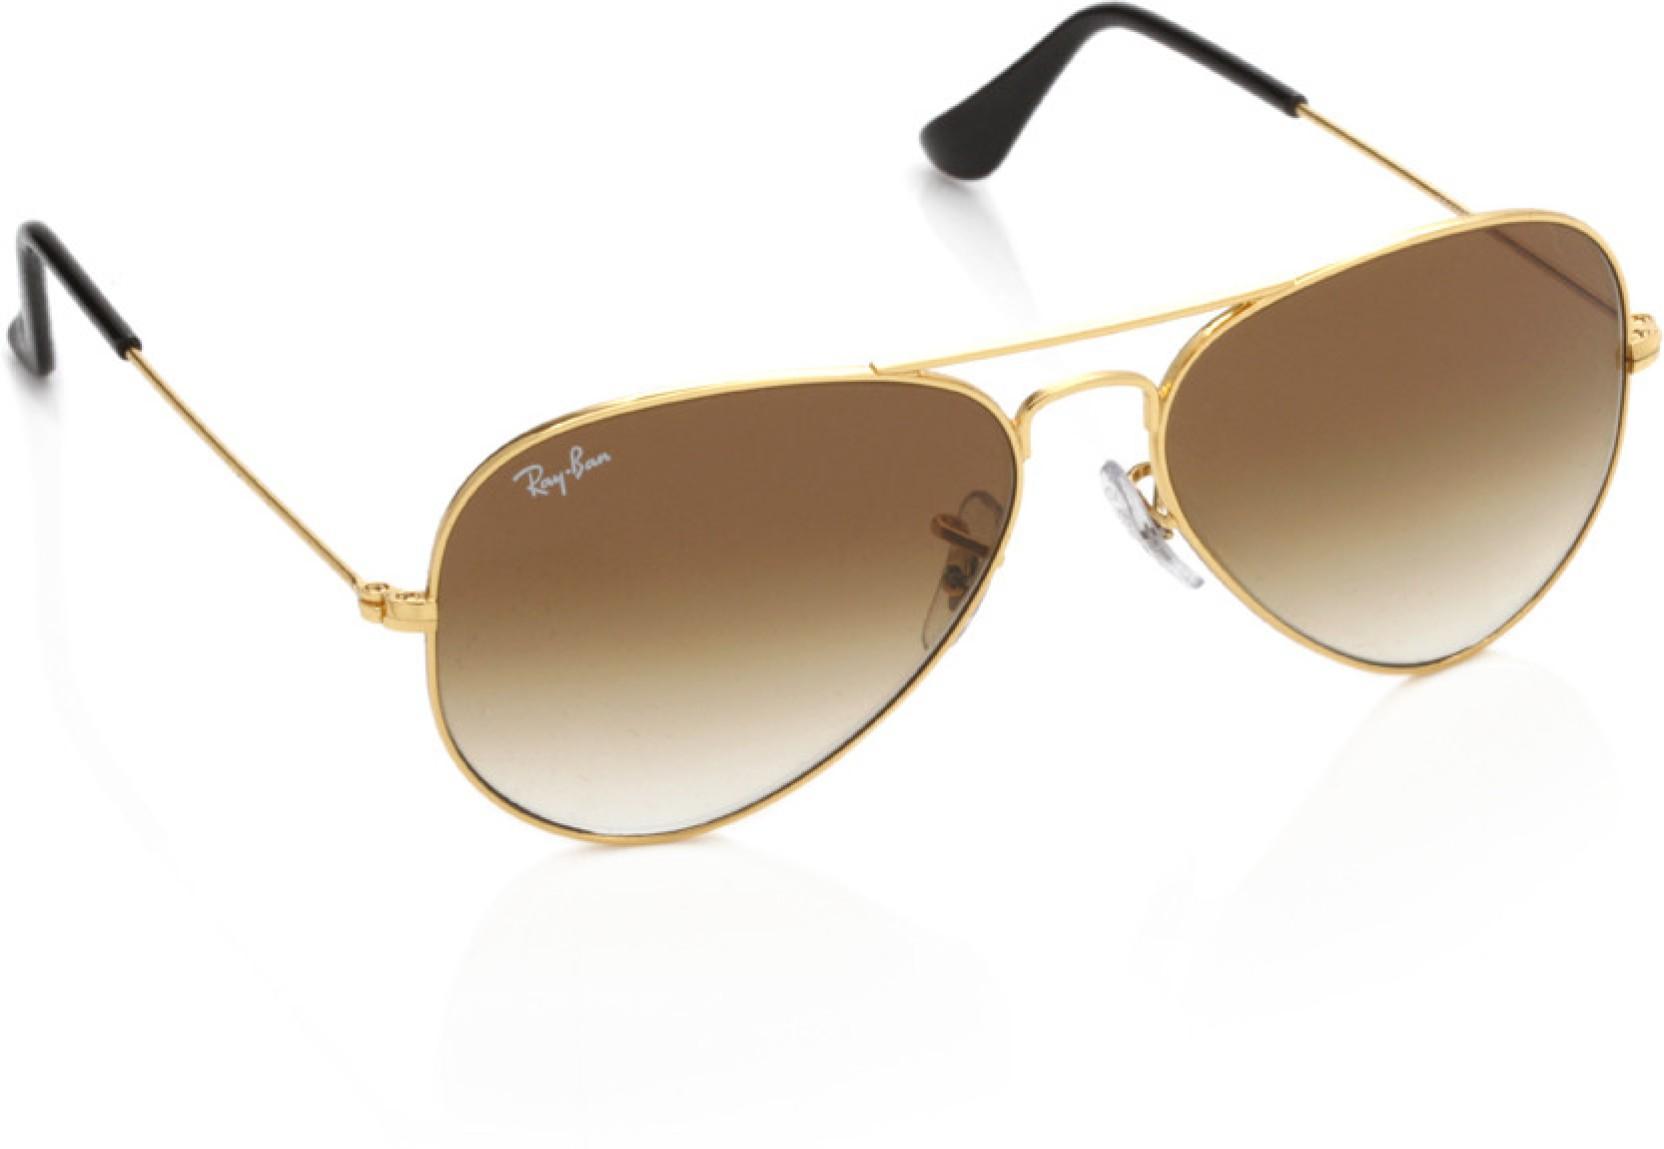 buy sunglasses online india ray ban